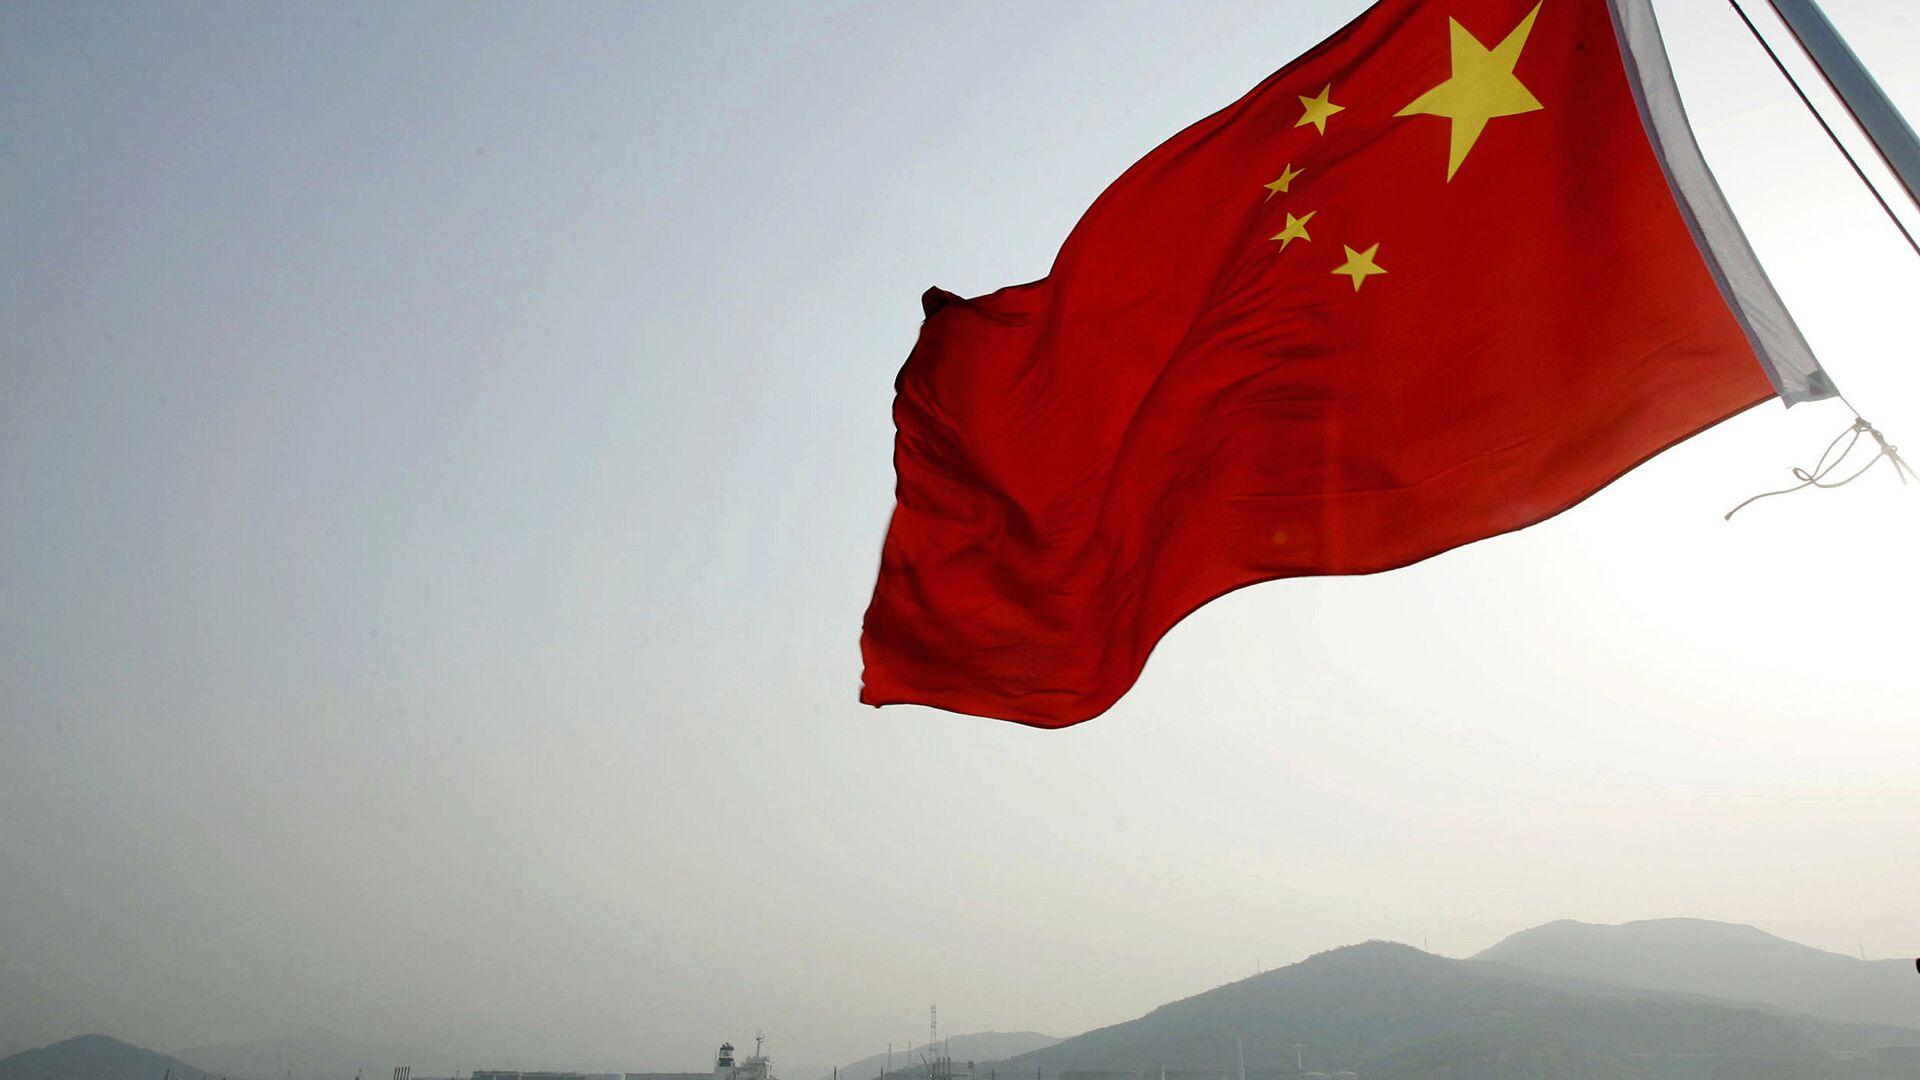 La bandiera cinese - Sputnik Italia, 1920, 08.09.2021